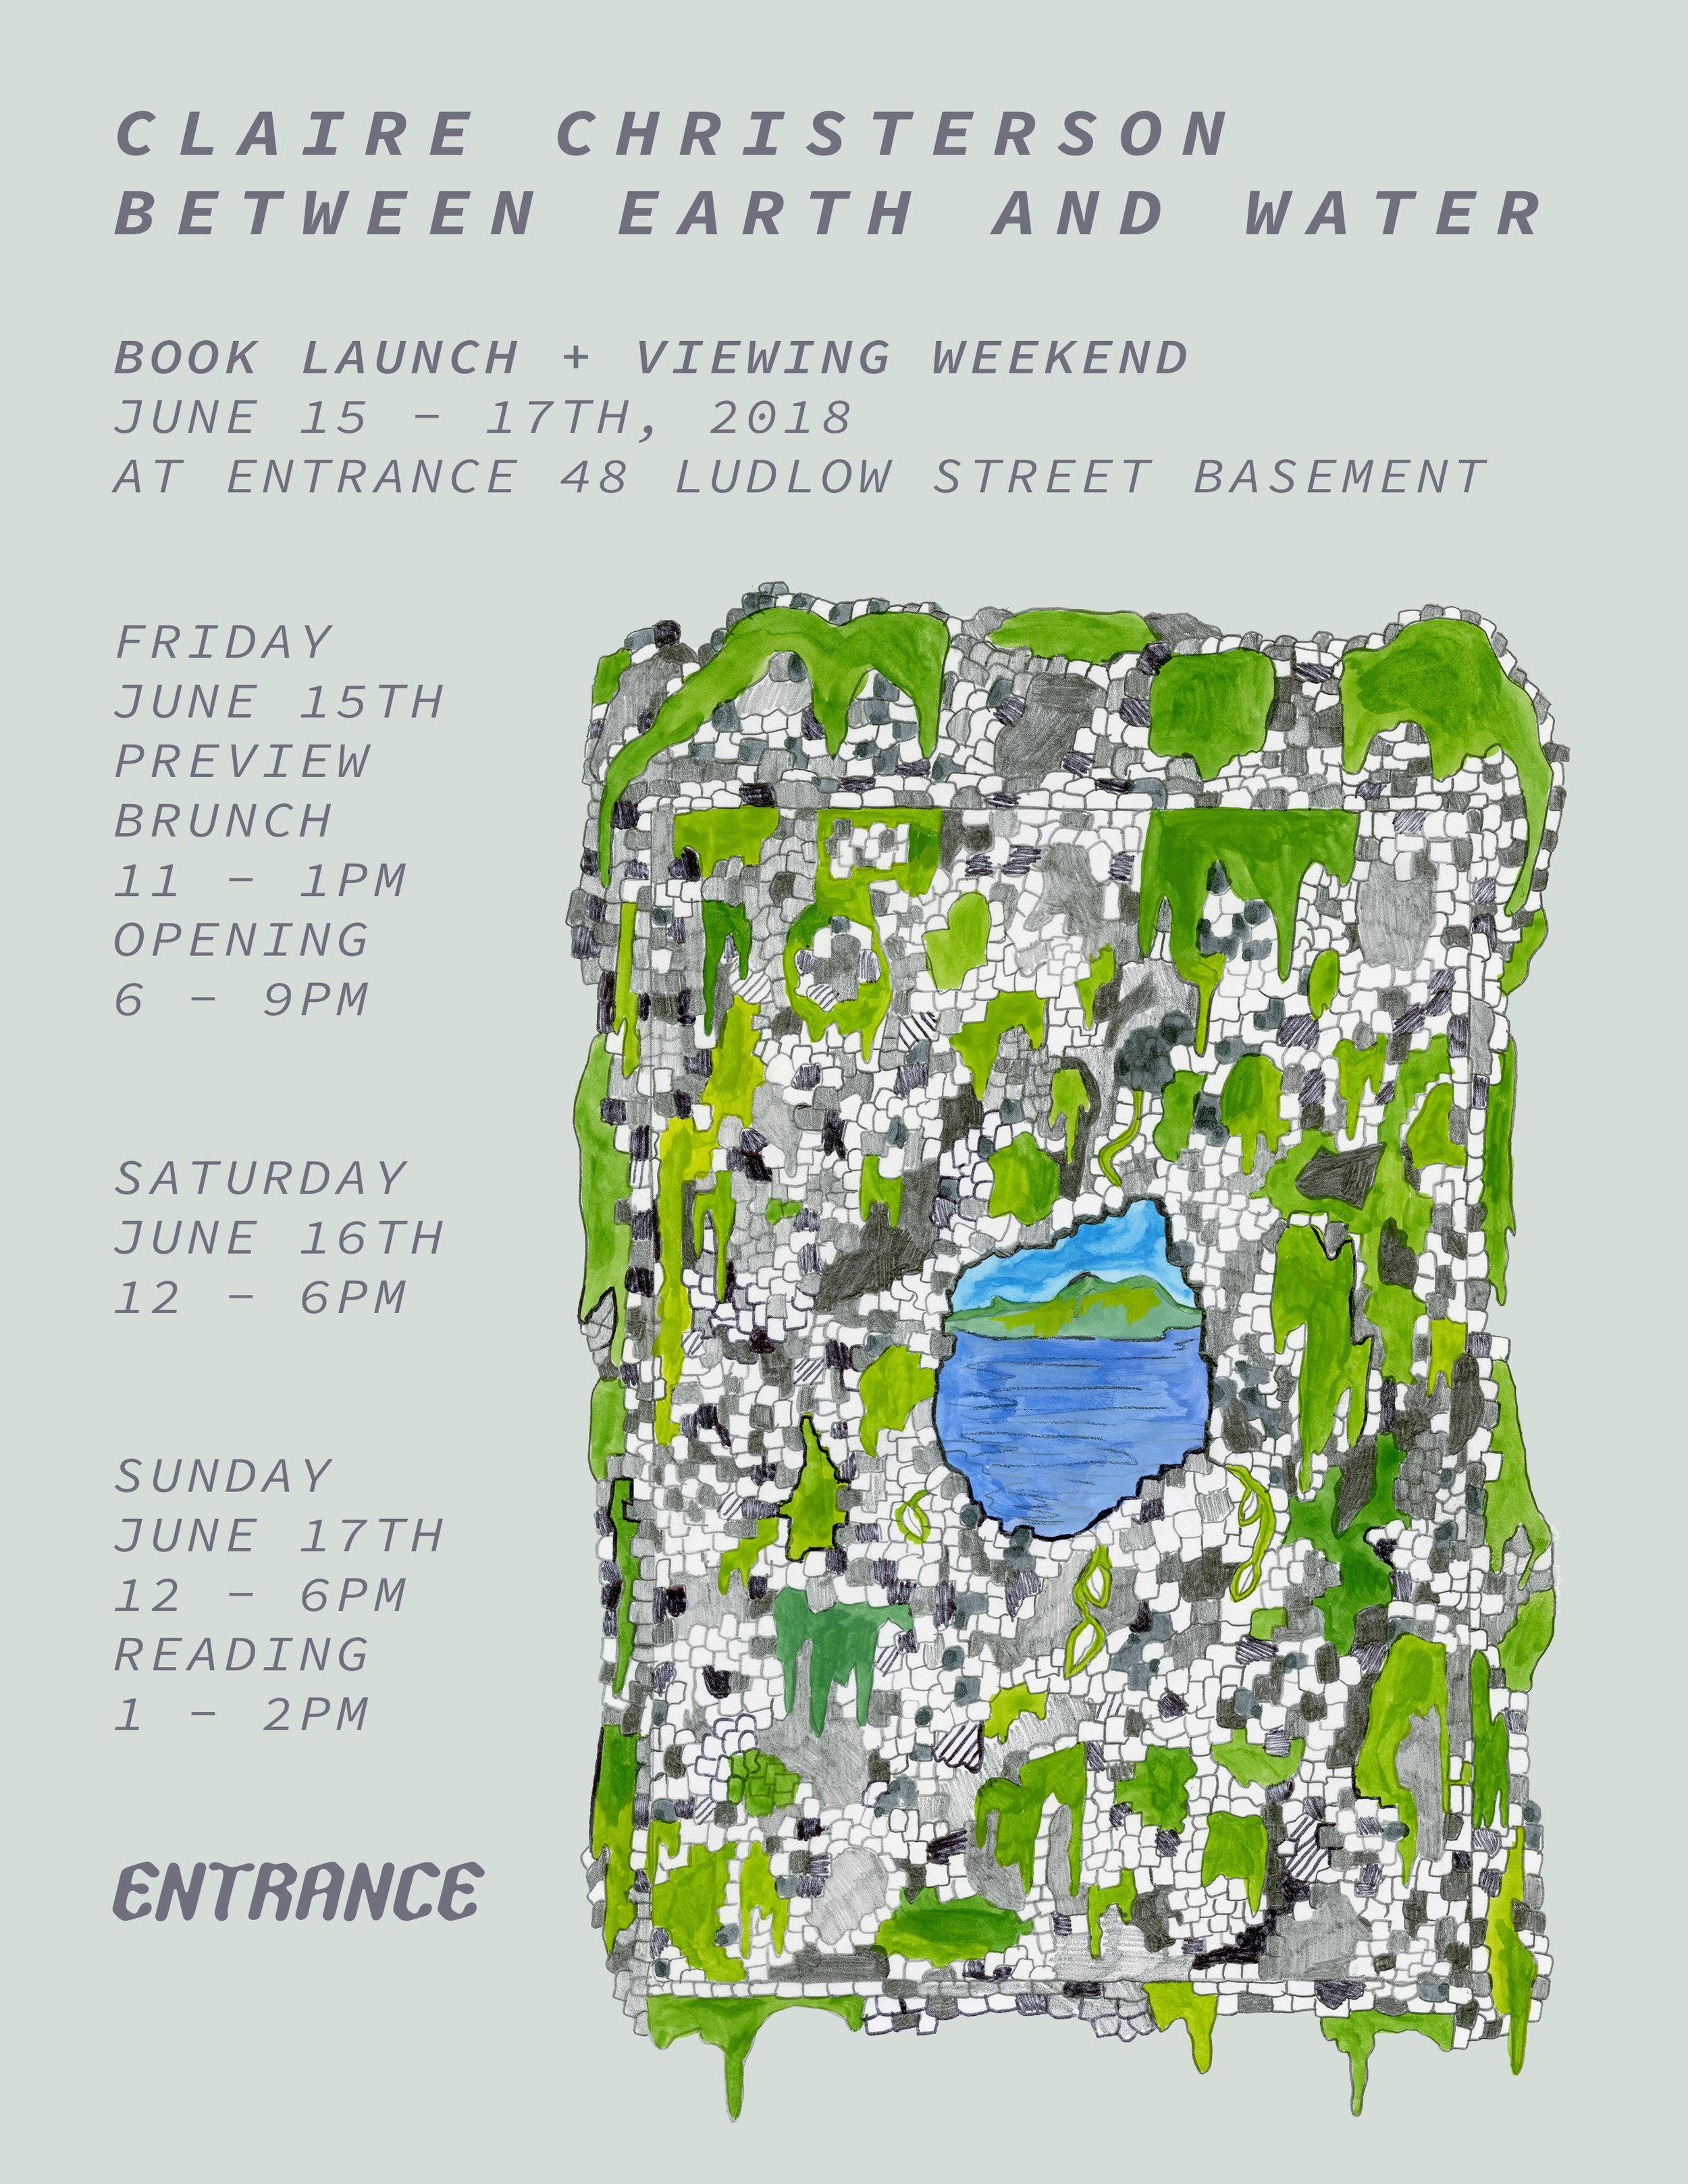 Christerson Book Launch Flyer.jpg